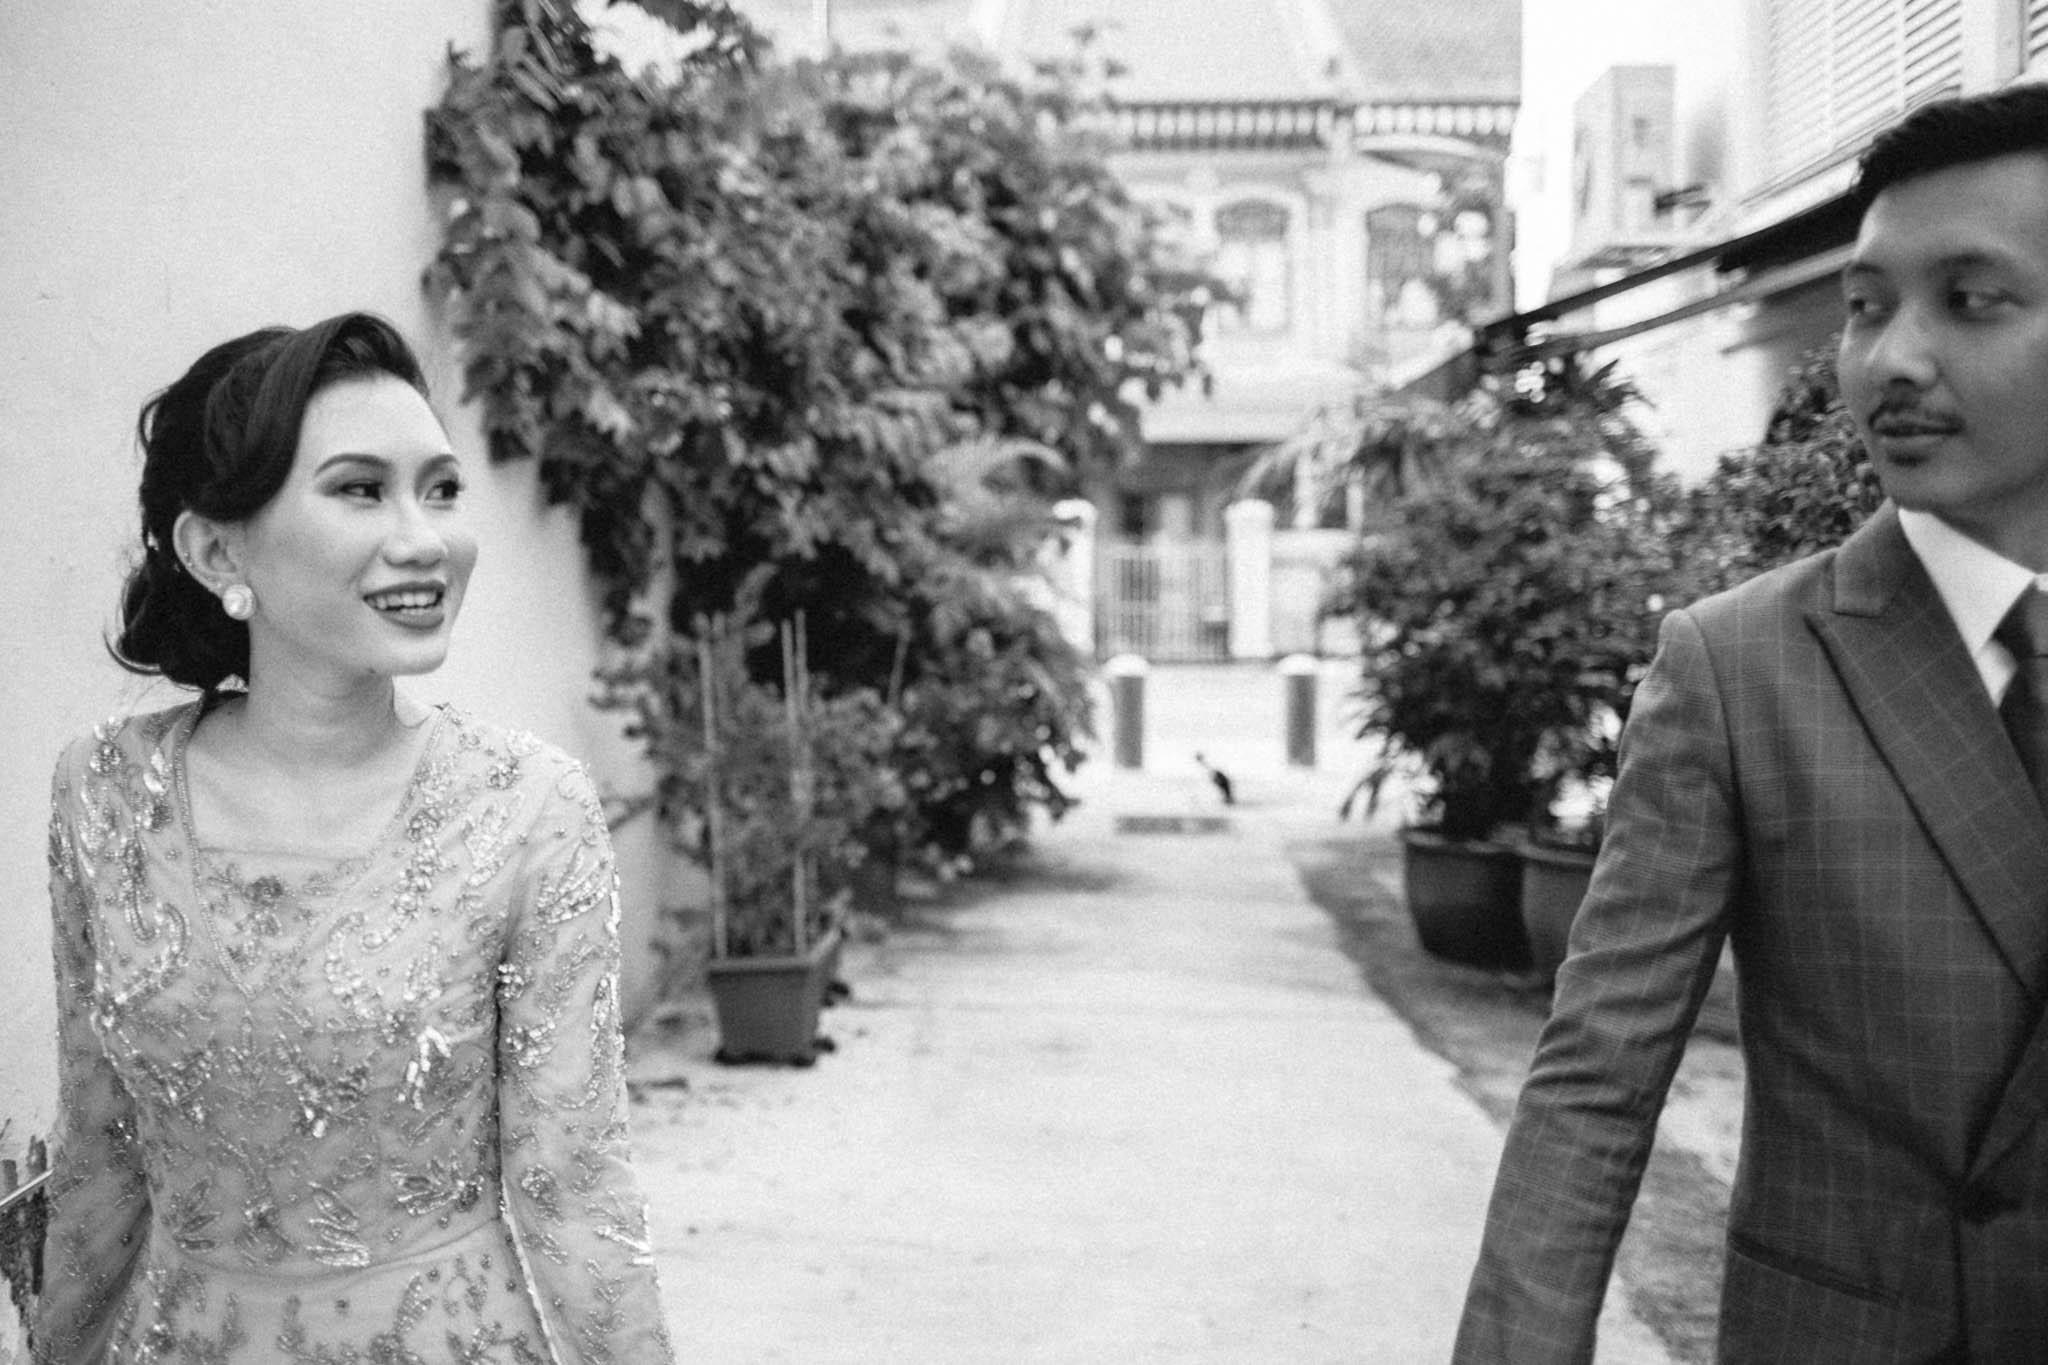 singapore-wedding-photographer-wedding-nufail-addafiq-088.jpg